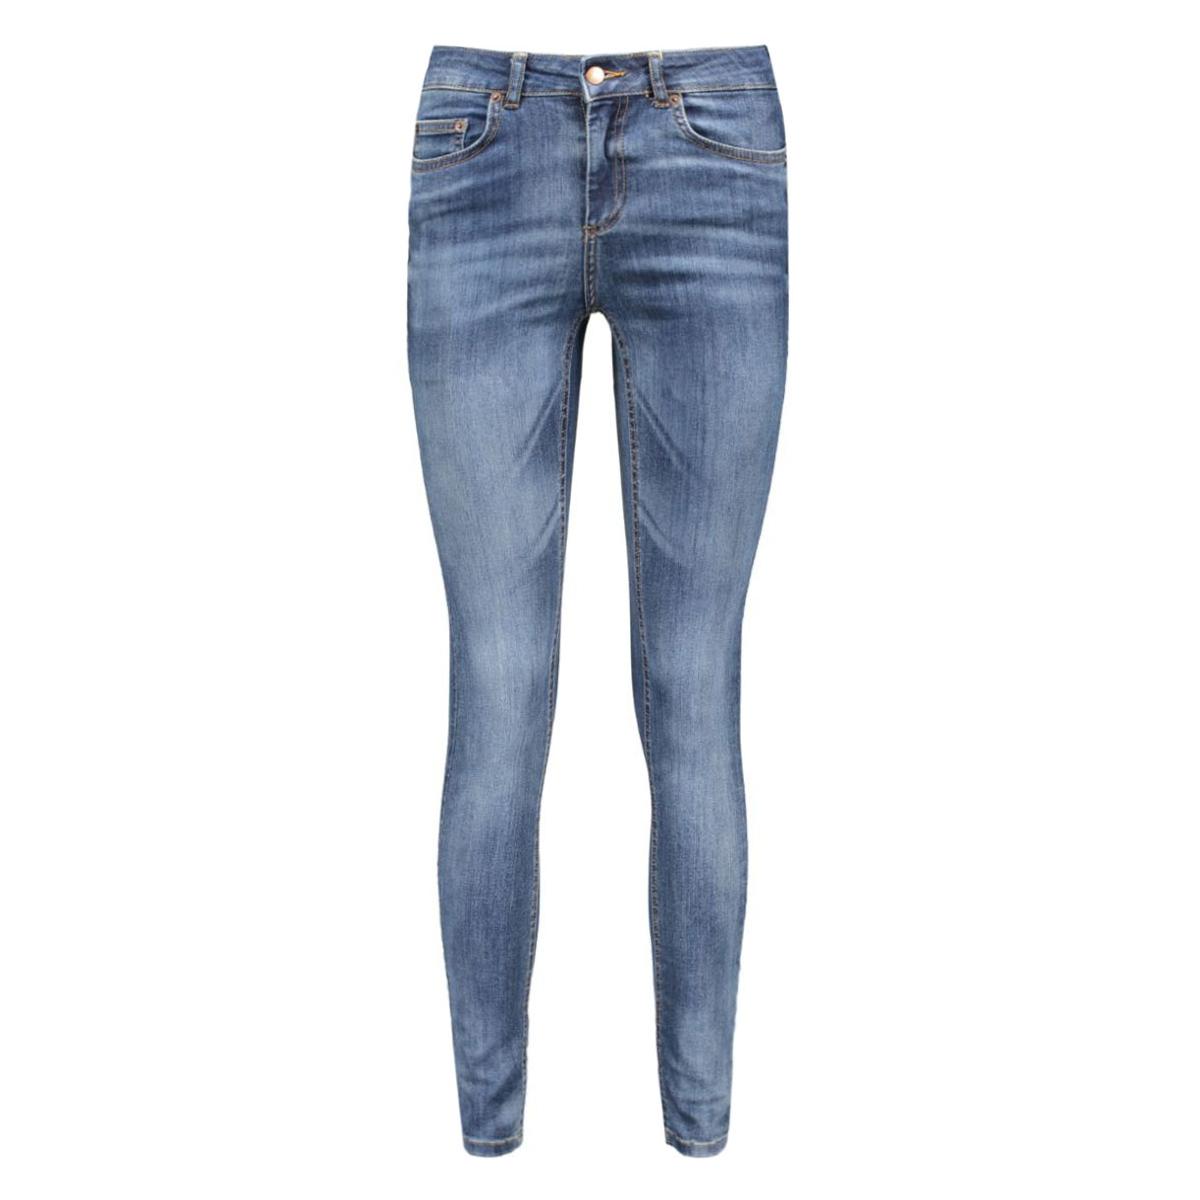 pcfive delly jeans dbld noos 17080503 pieces jeans dark blue denim